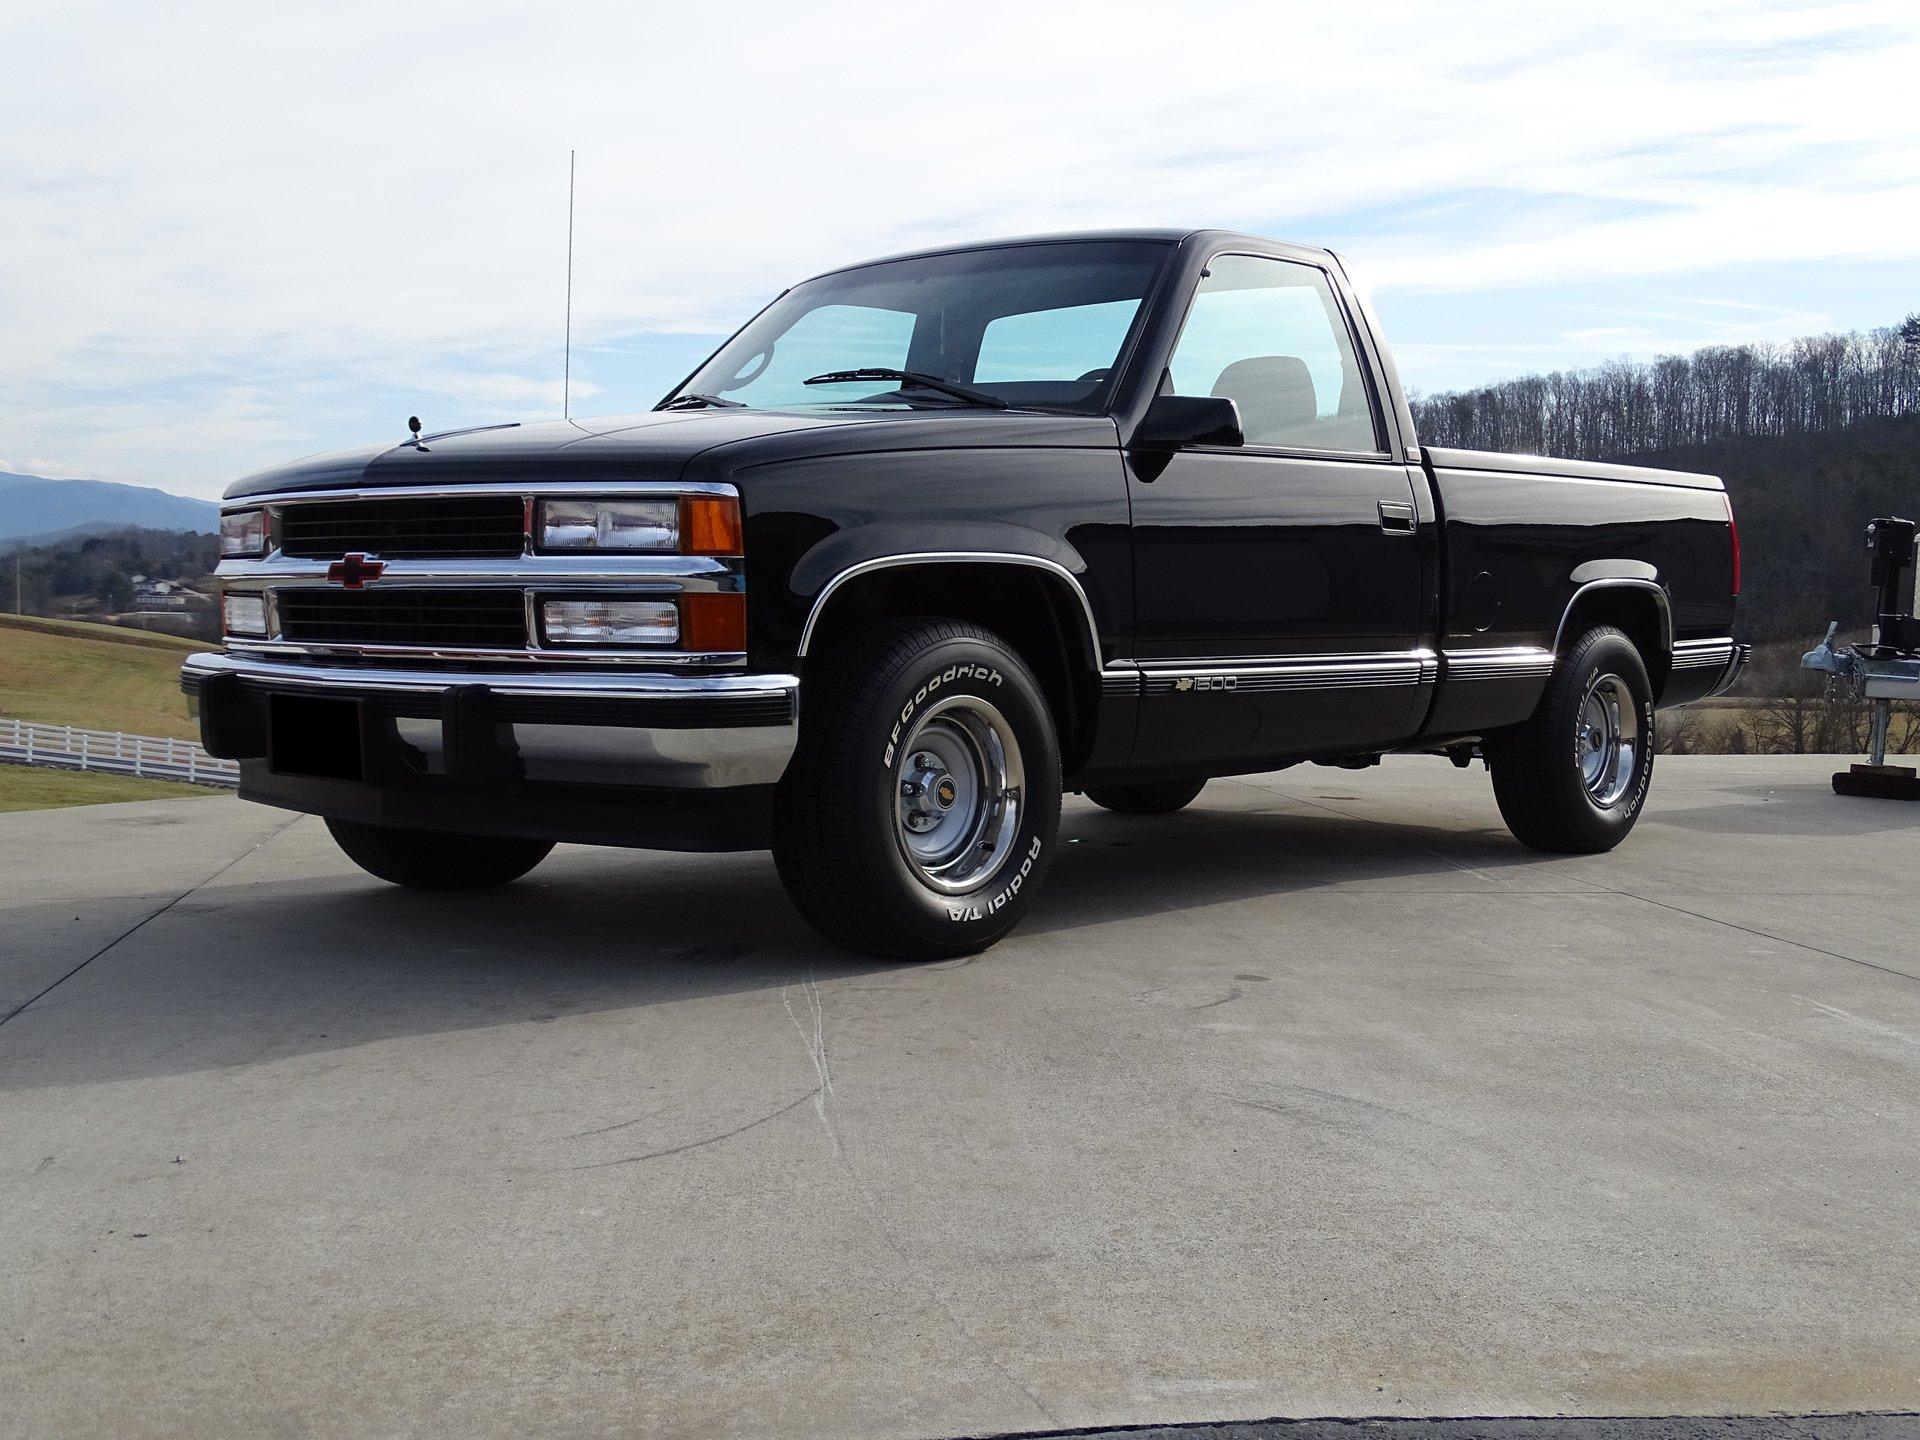 1996 Chevrolet Silverado | GAA Classic Cars